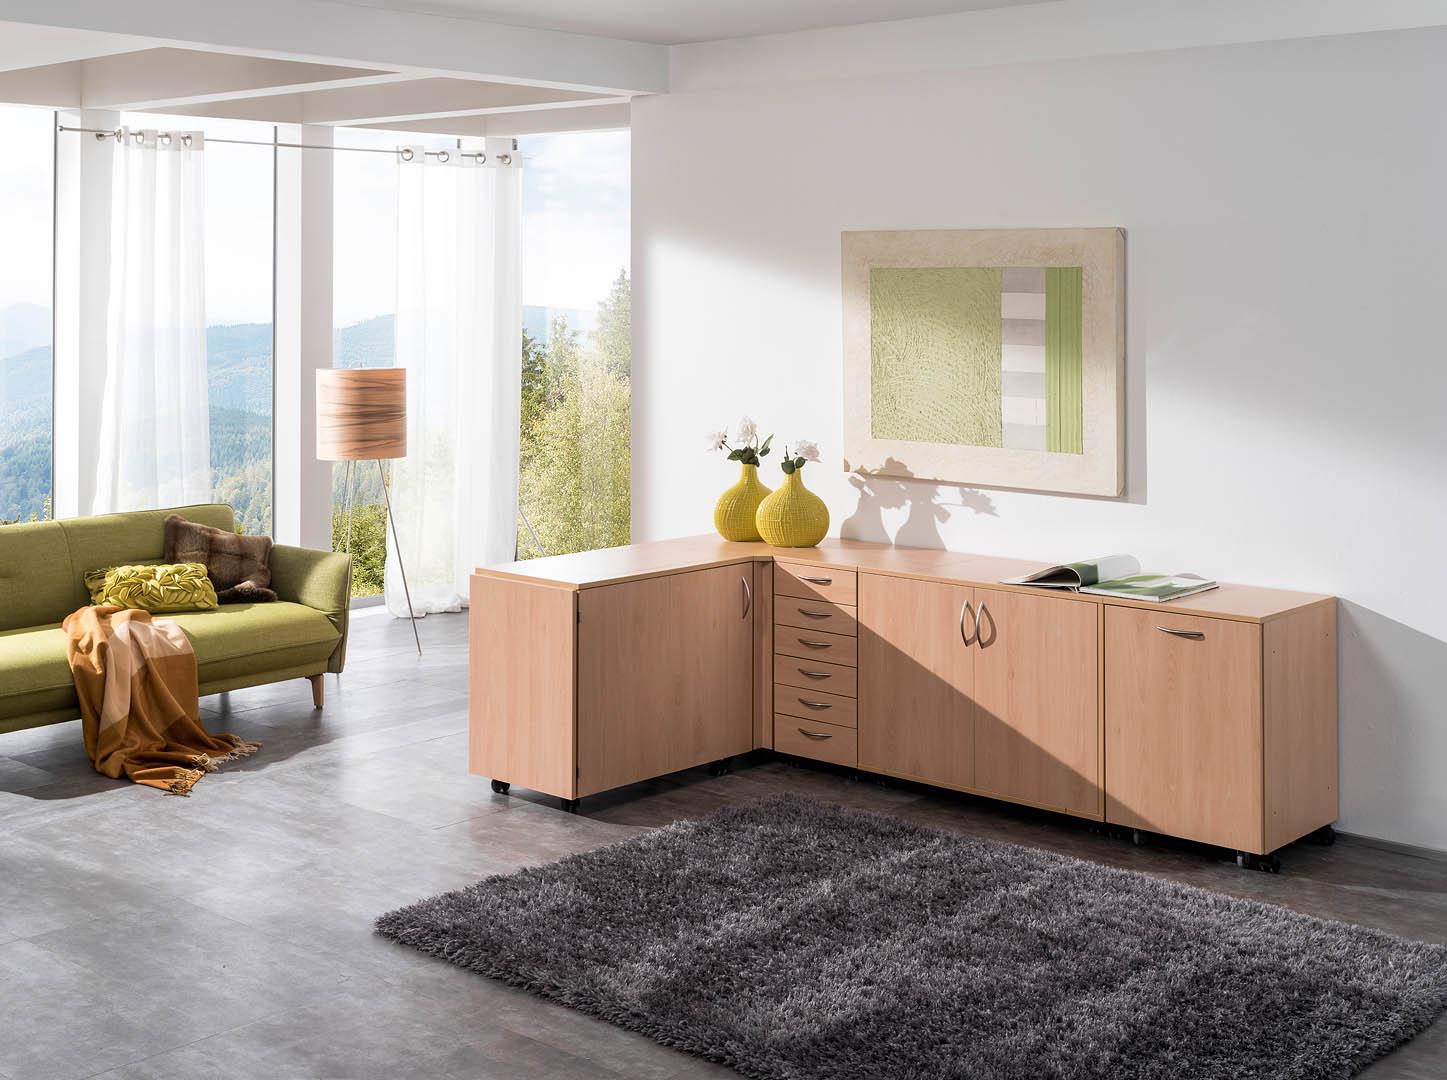 base klapp platte mit k sten mit neuem elektr easy softtech lift n hwelt flach. Black Bedroom Furniture Sets. Home Design Ideas